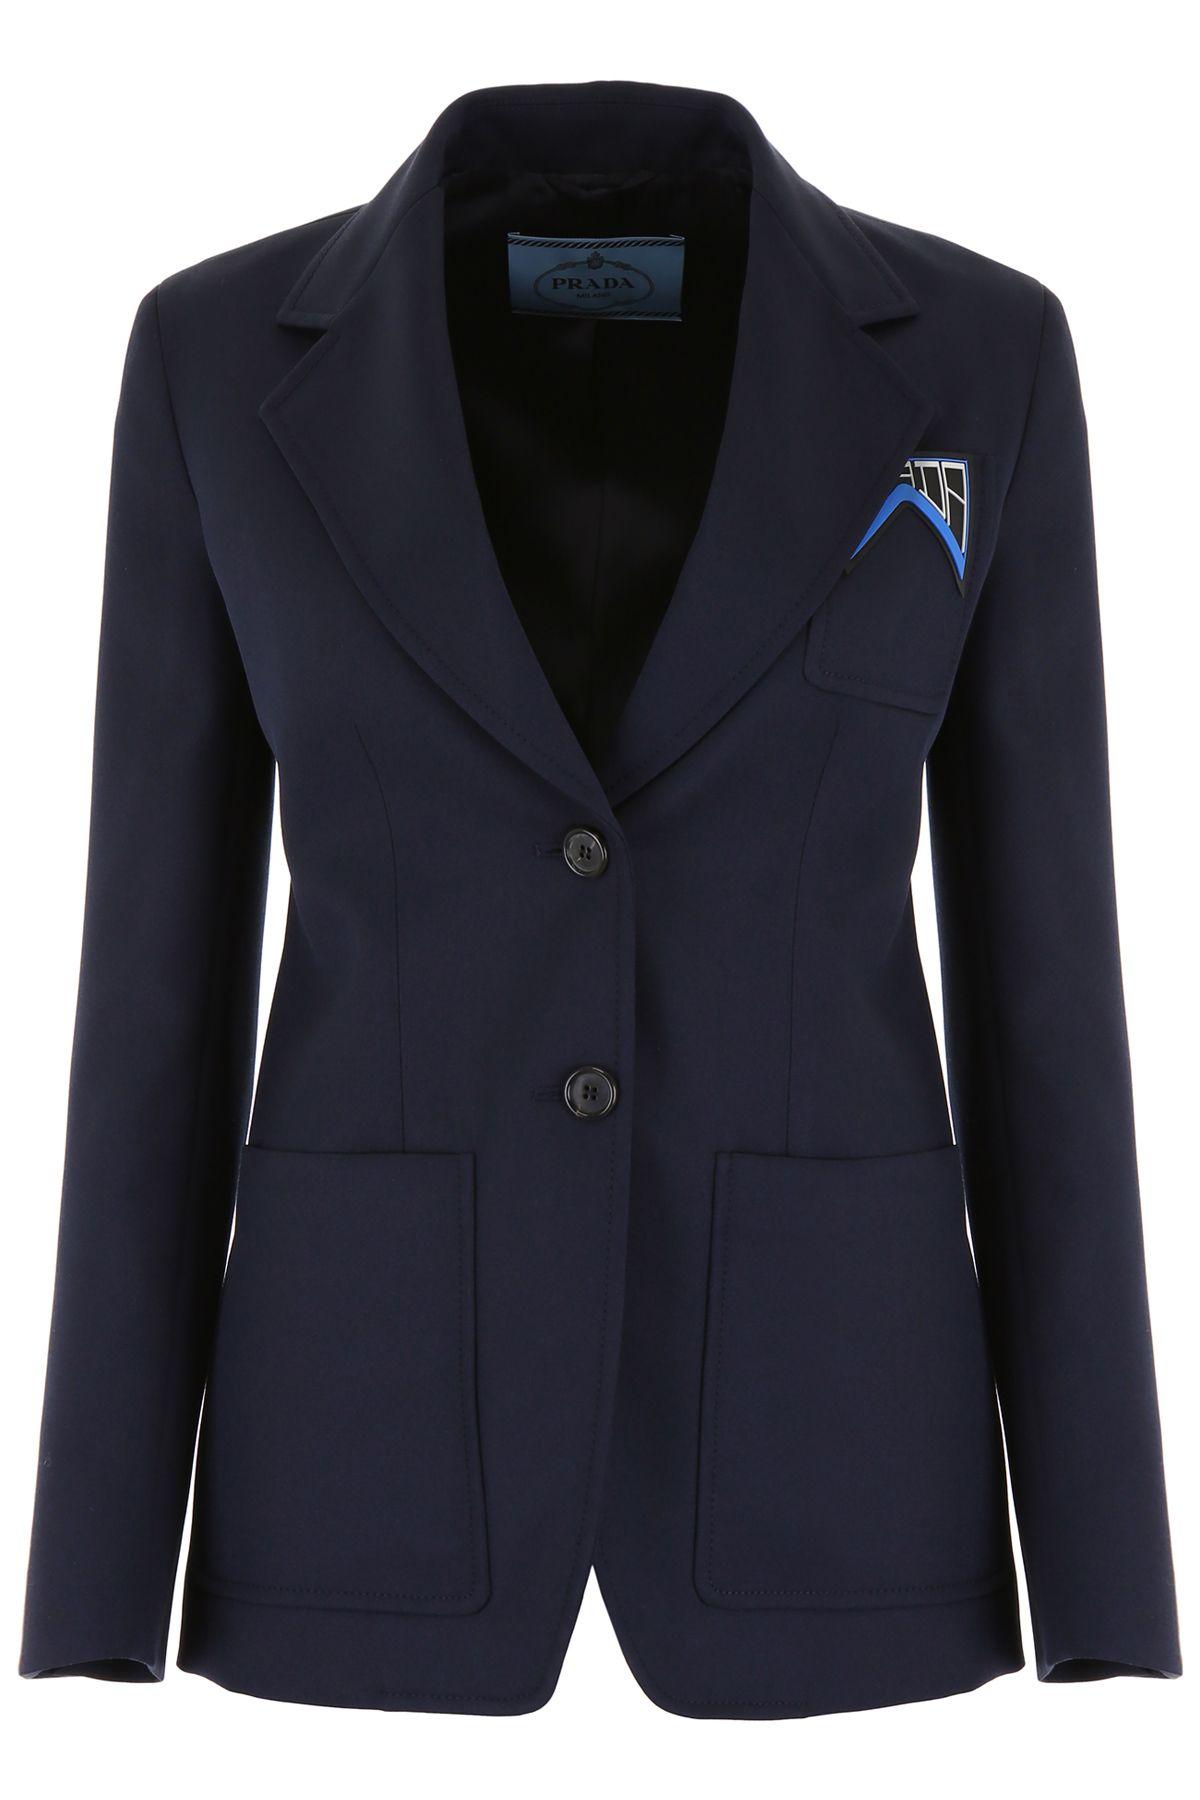 Bleu Prada Blazer In Gabardine Logo With rXxUrO